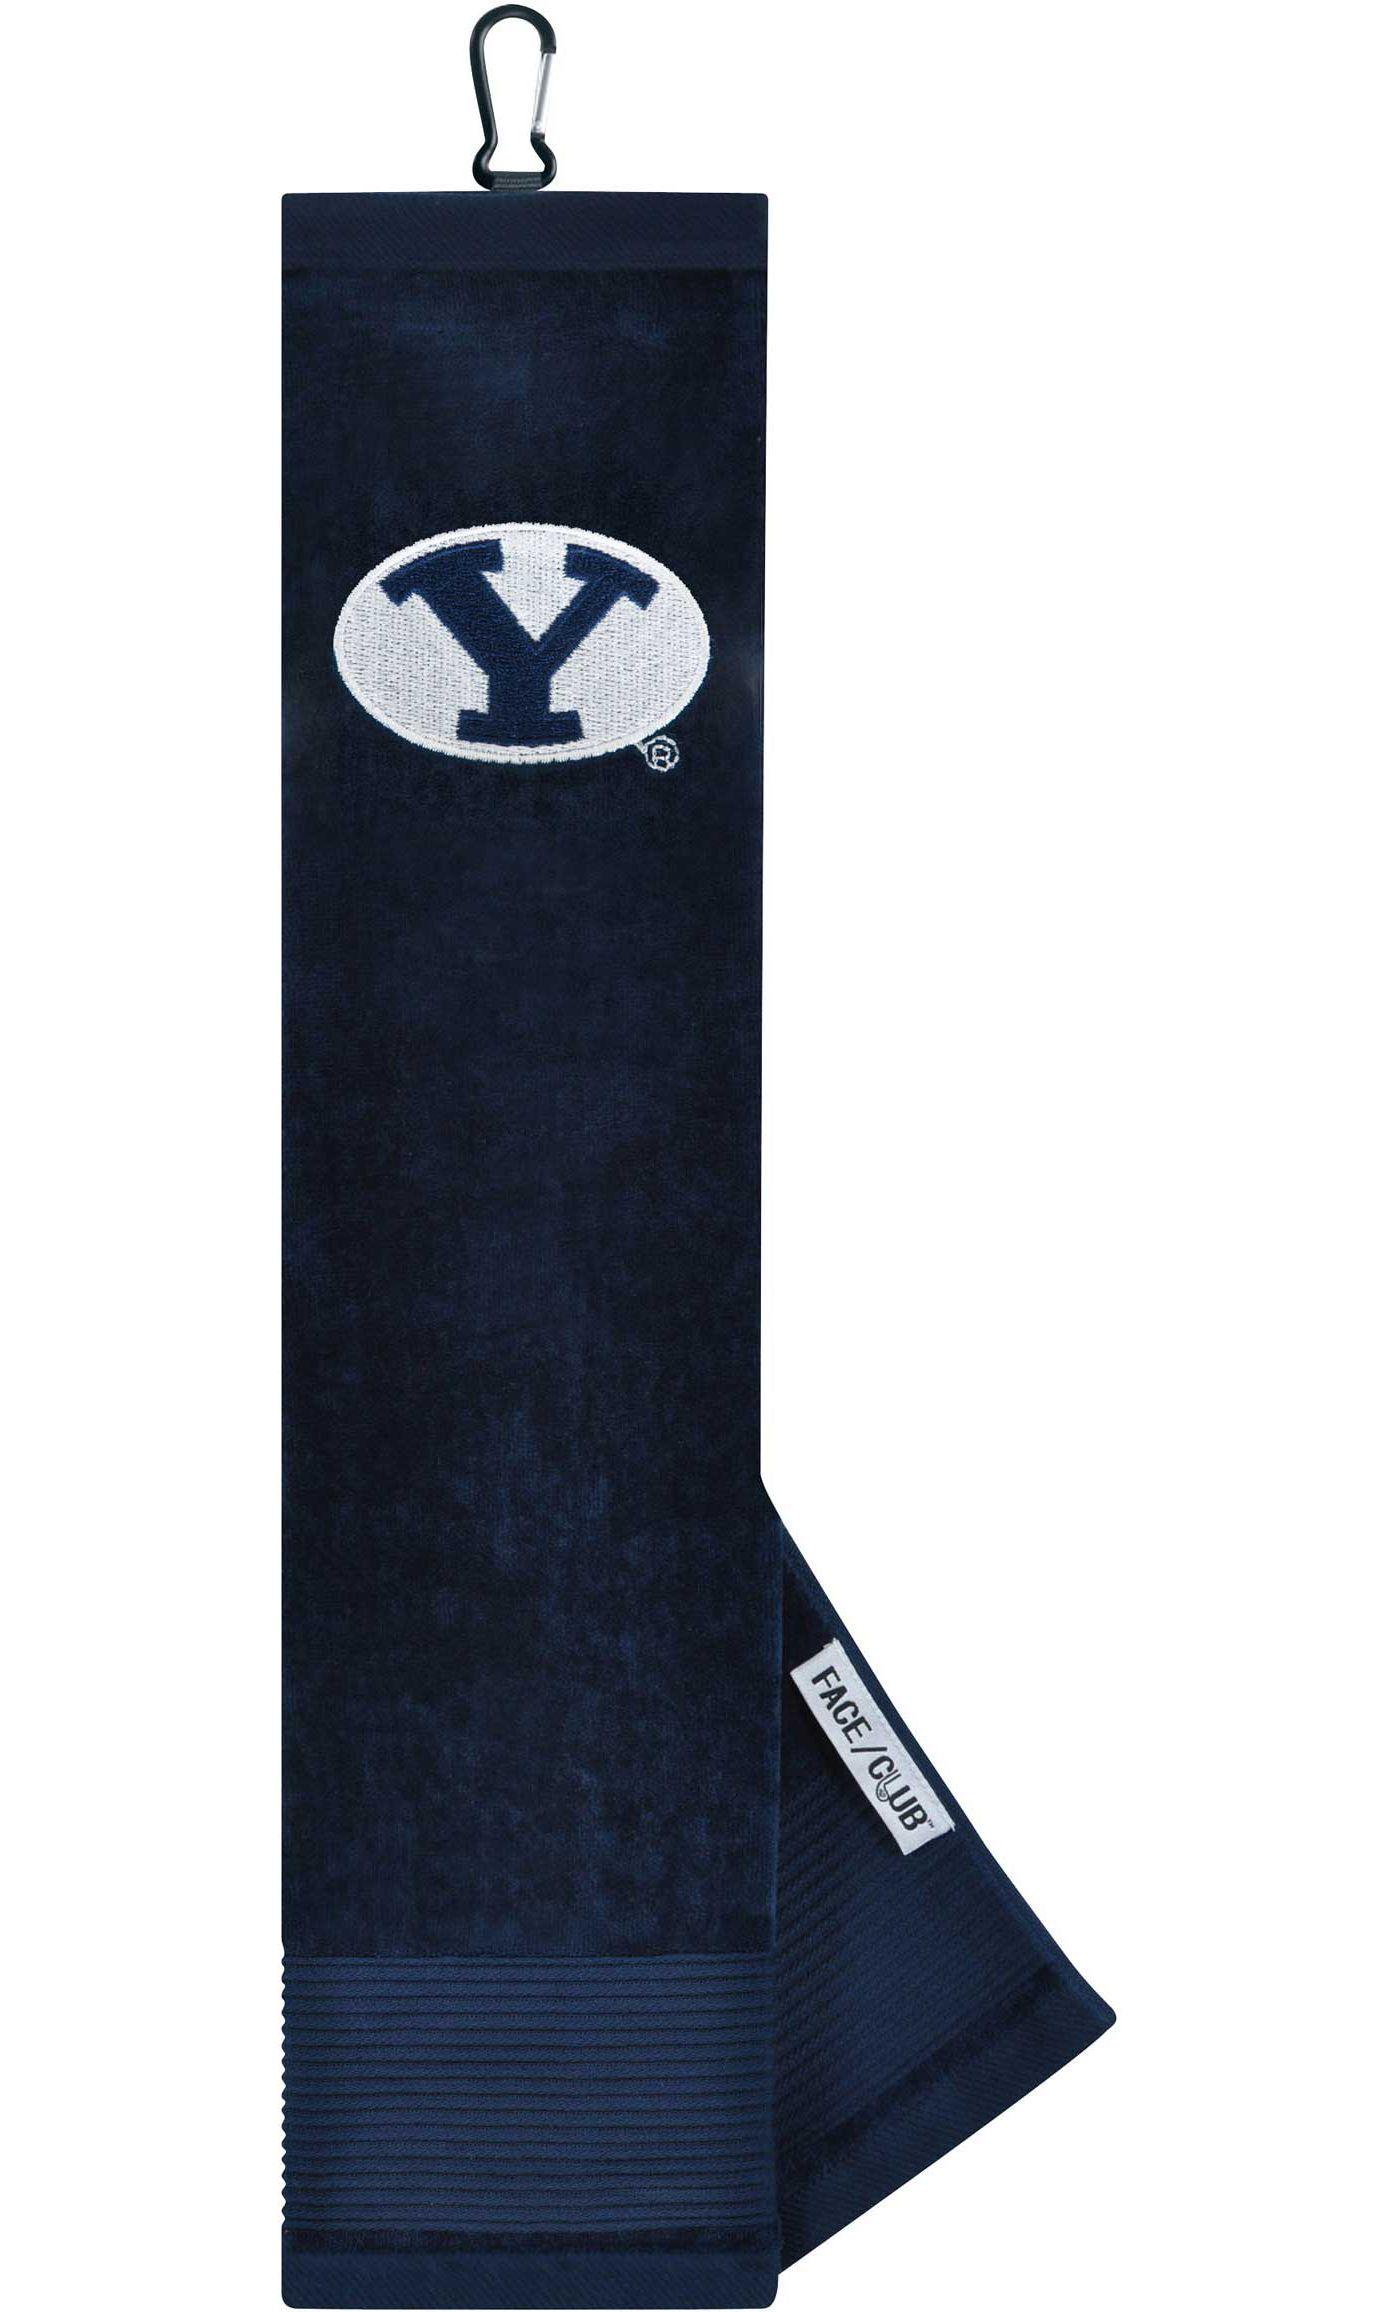 Team Effort BYU Cougars Embroidered Face/Club Tri-Fold Towel